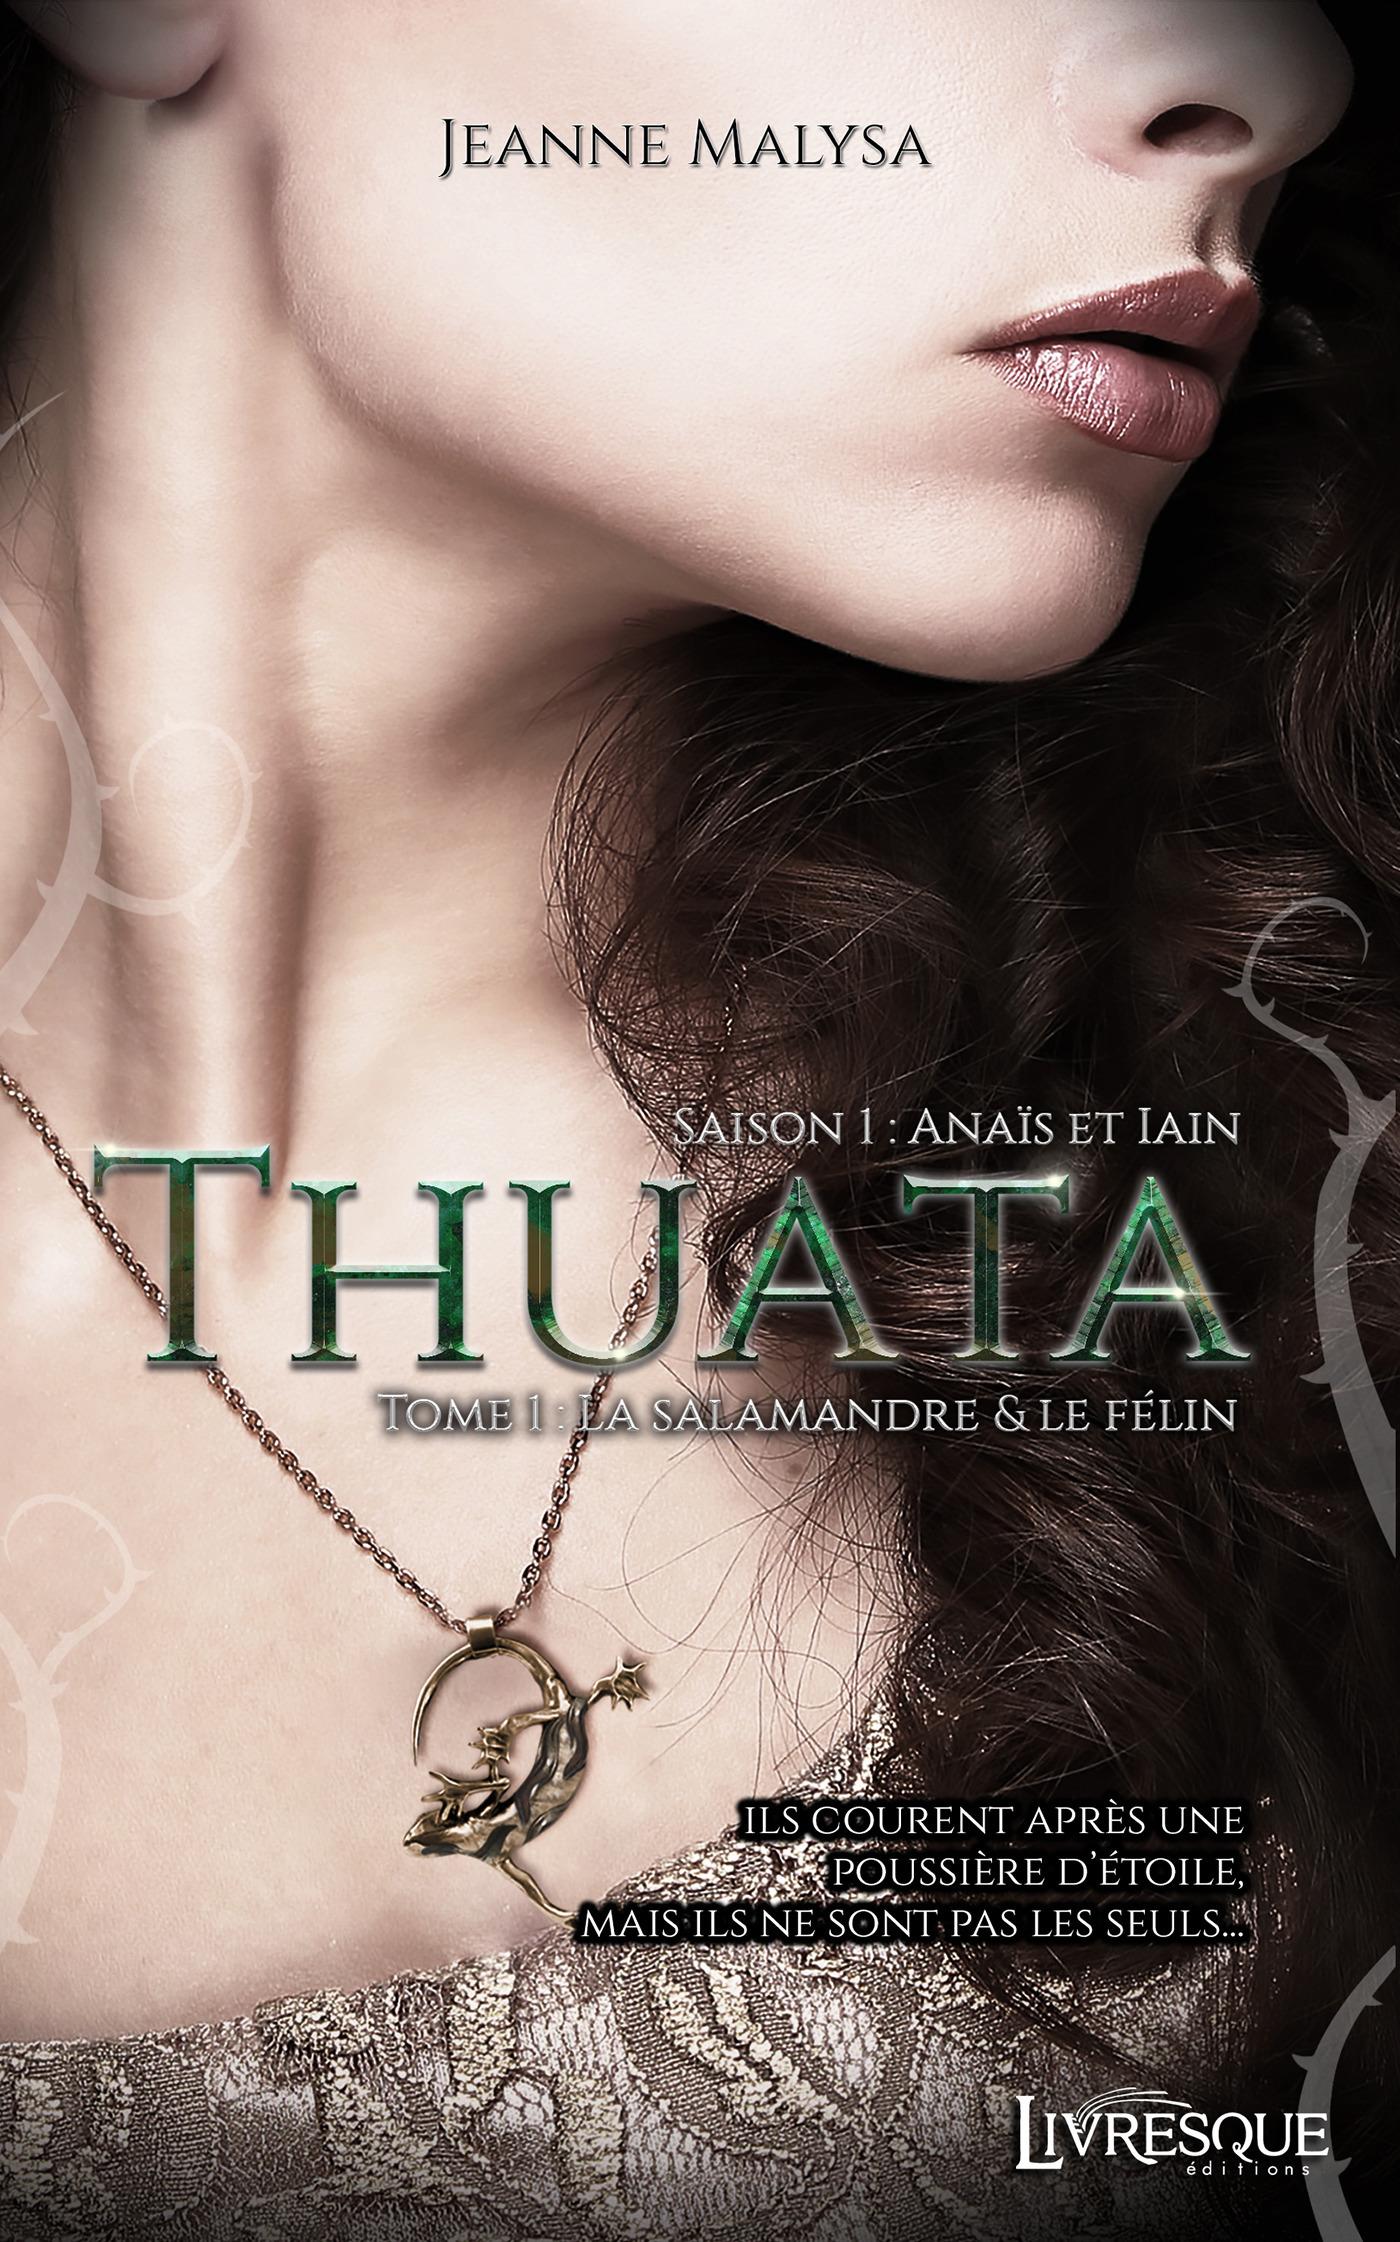 Thuata, saison 1 : Anaïs & Iain t.1 ; la salamandre & le félin